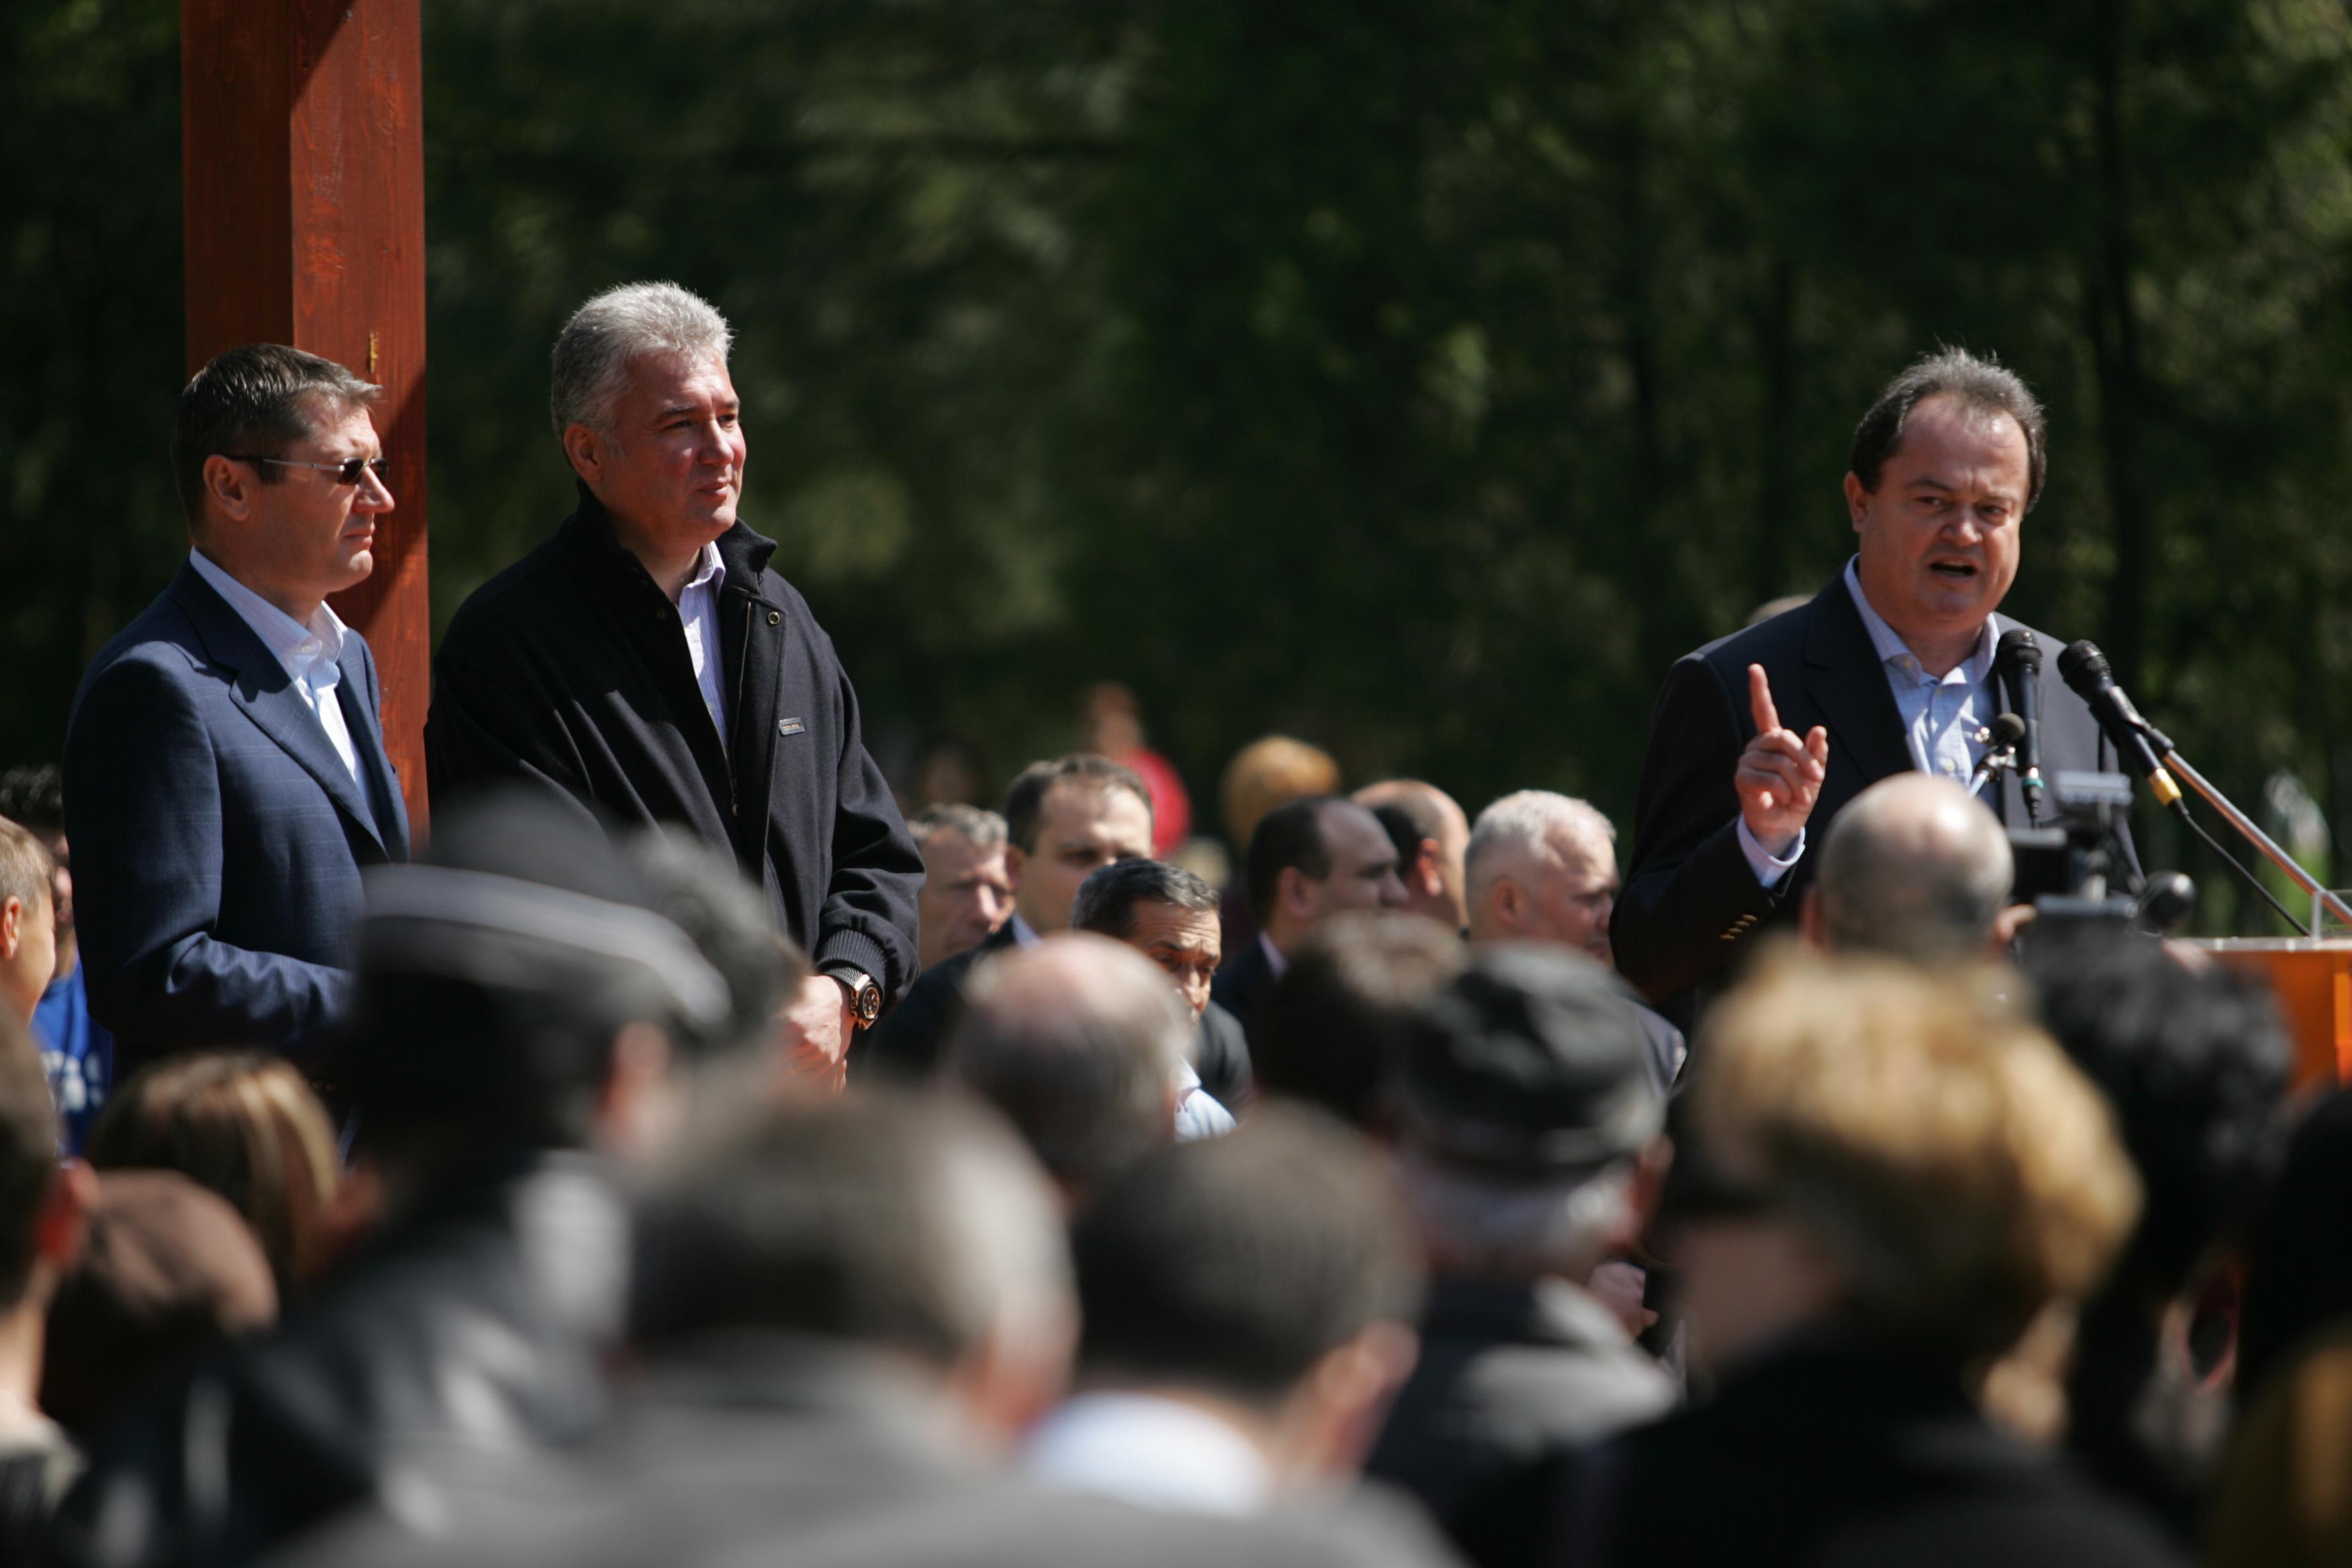 Blaga anunta ca Adriean Videanu si-a dat demisia de la sefia PDL Bucuresti si e suspendat din partid